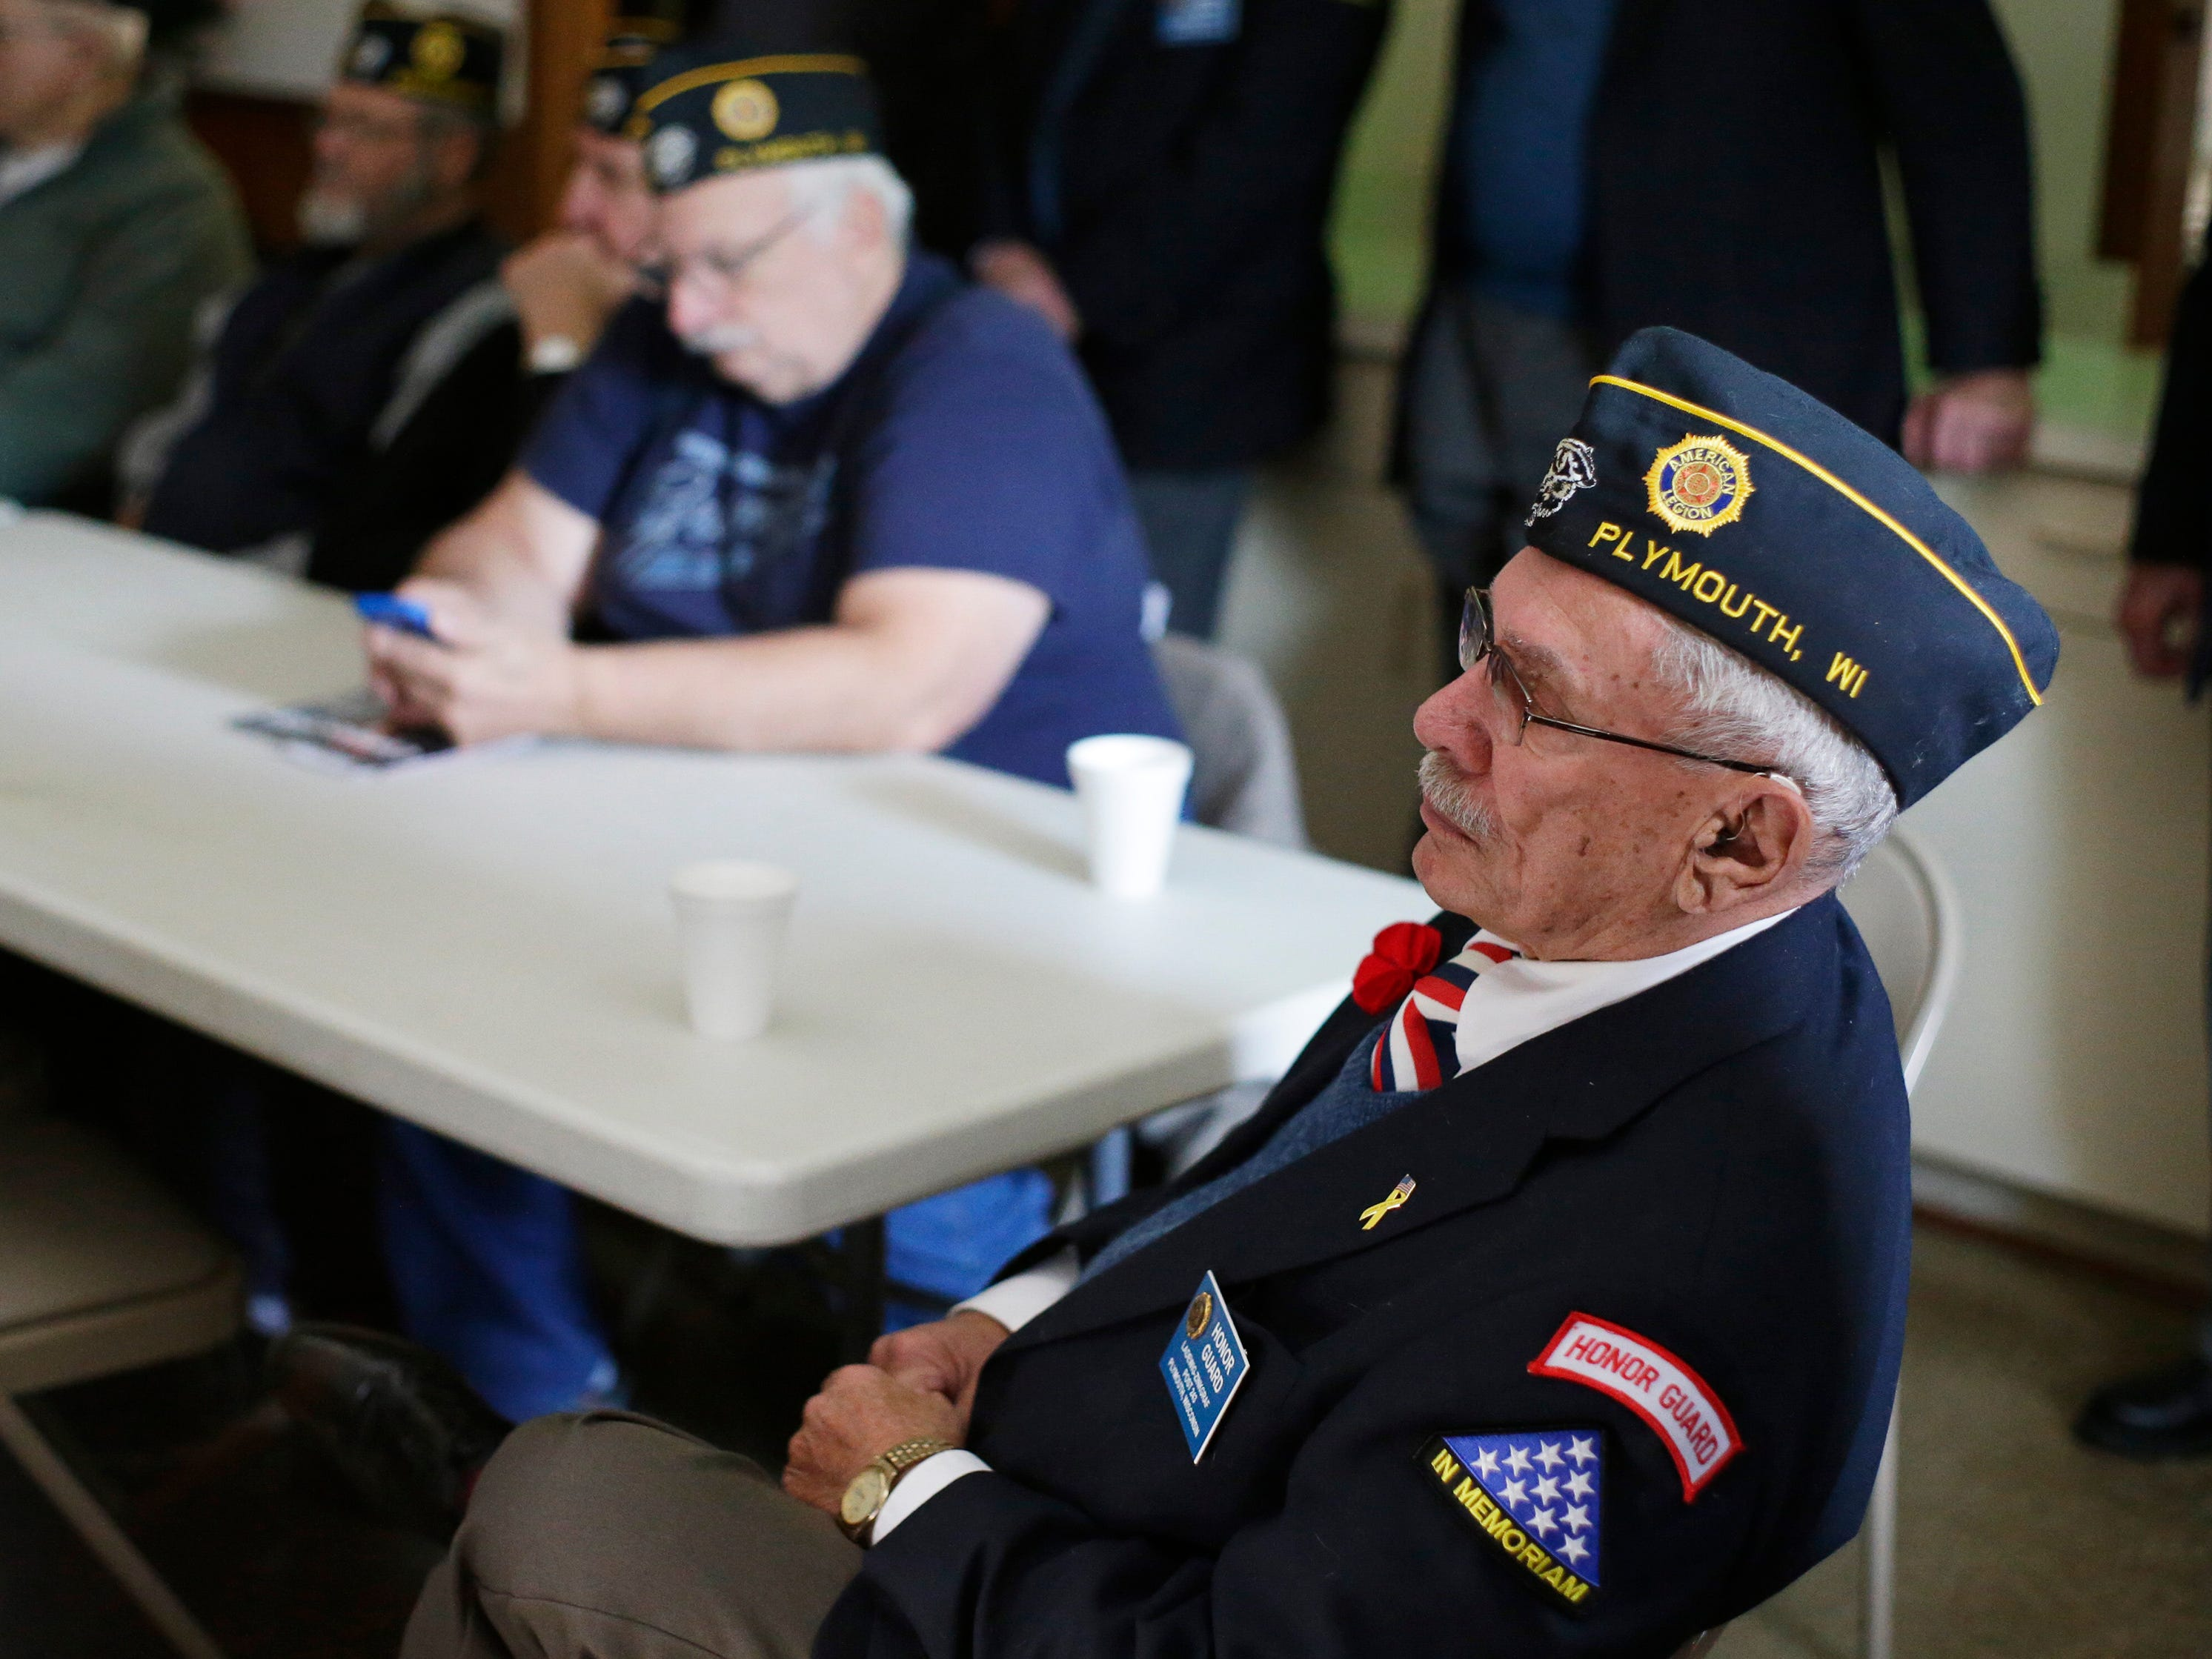 Members of American Legion, Ladwig-Zinkgraf Post 243, listen to the Pearl Harbor Program, Friday, December 7, 2018, in Plymouth, Wis.